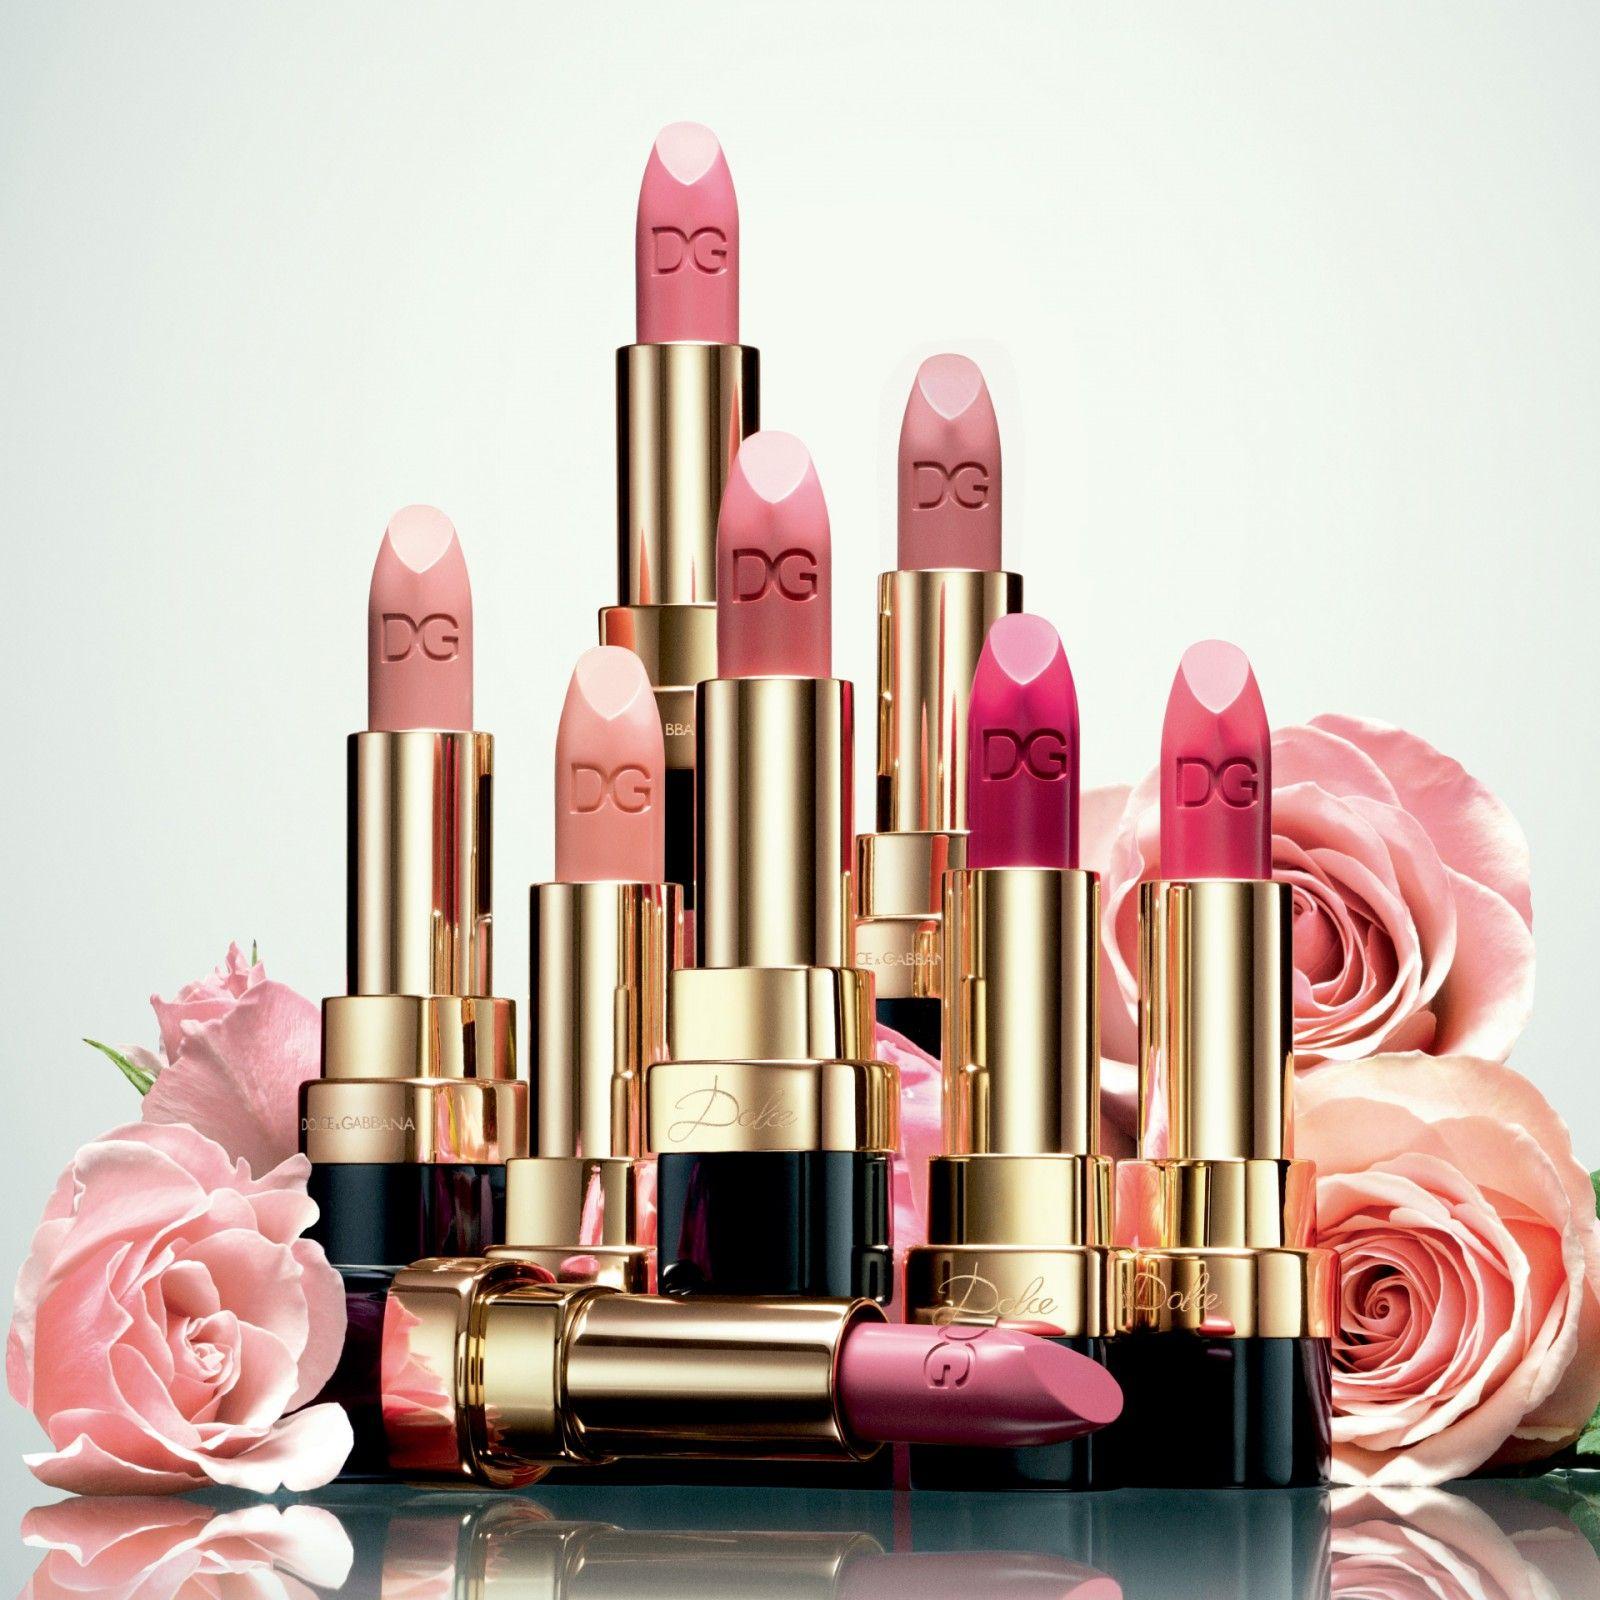 11 shades of pink Dolce, gabbana makeup, Lipstick, Makeup